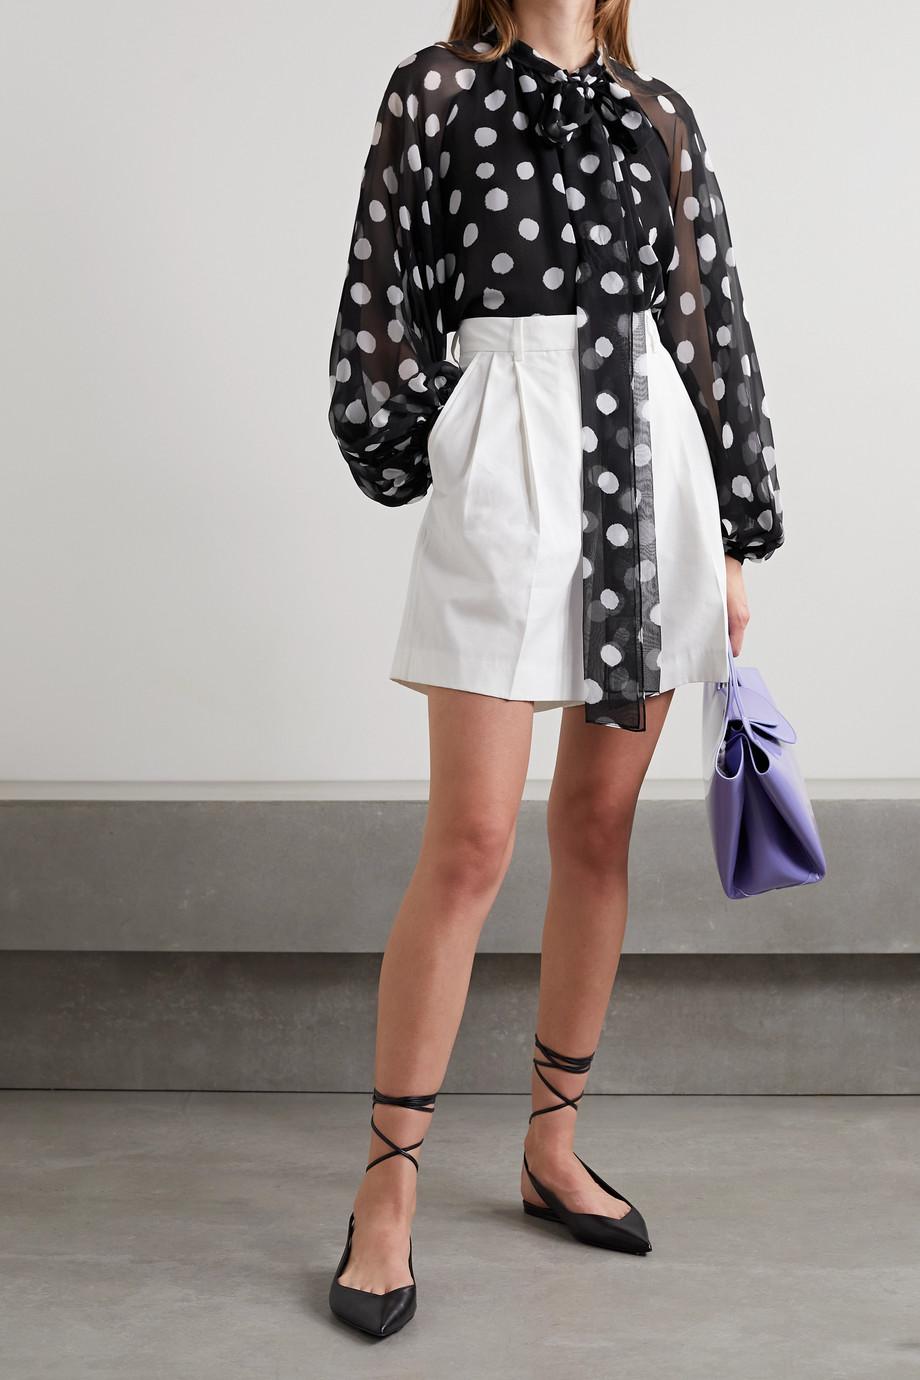 Carolina Herrera Pussy-bow polka-dot silk-chiffon blouse